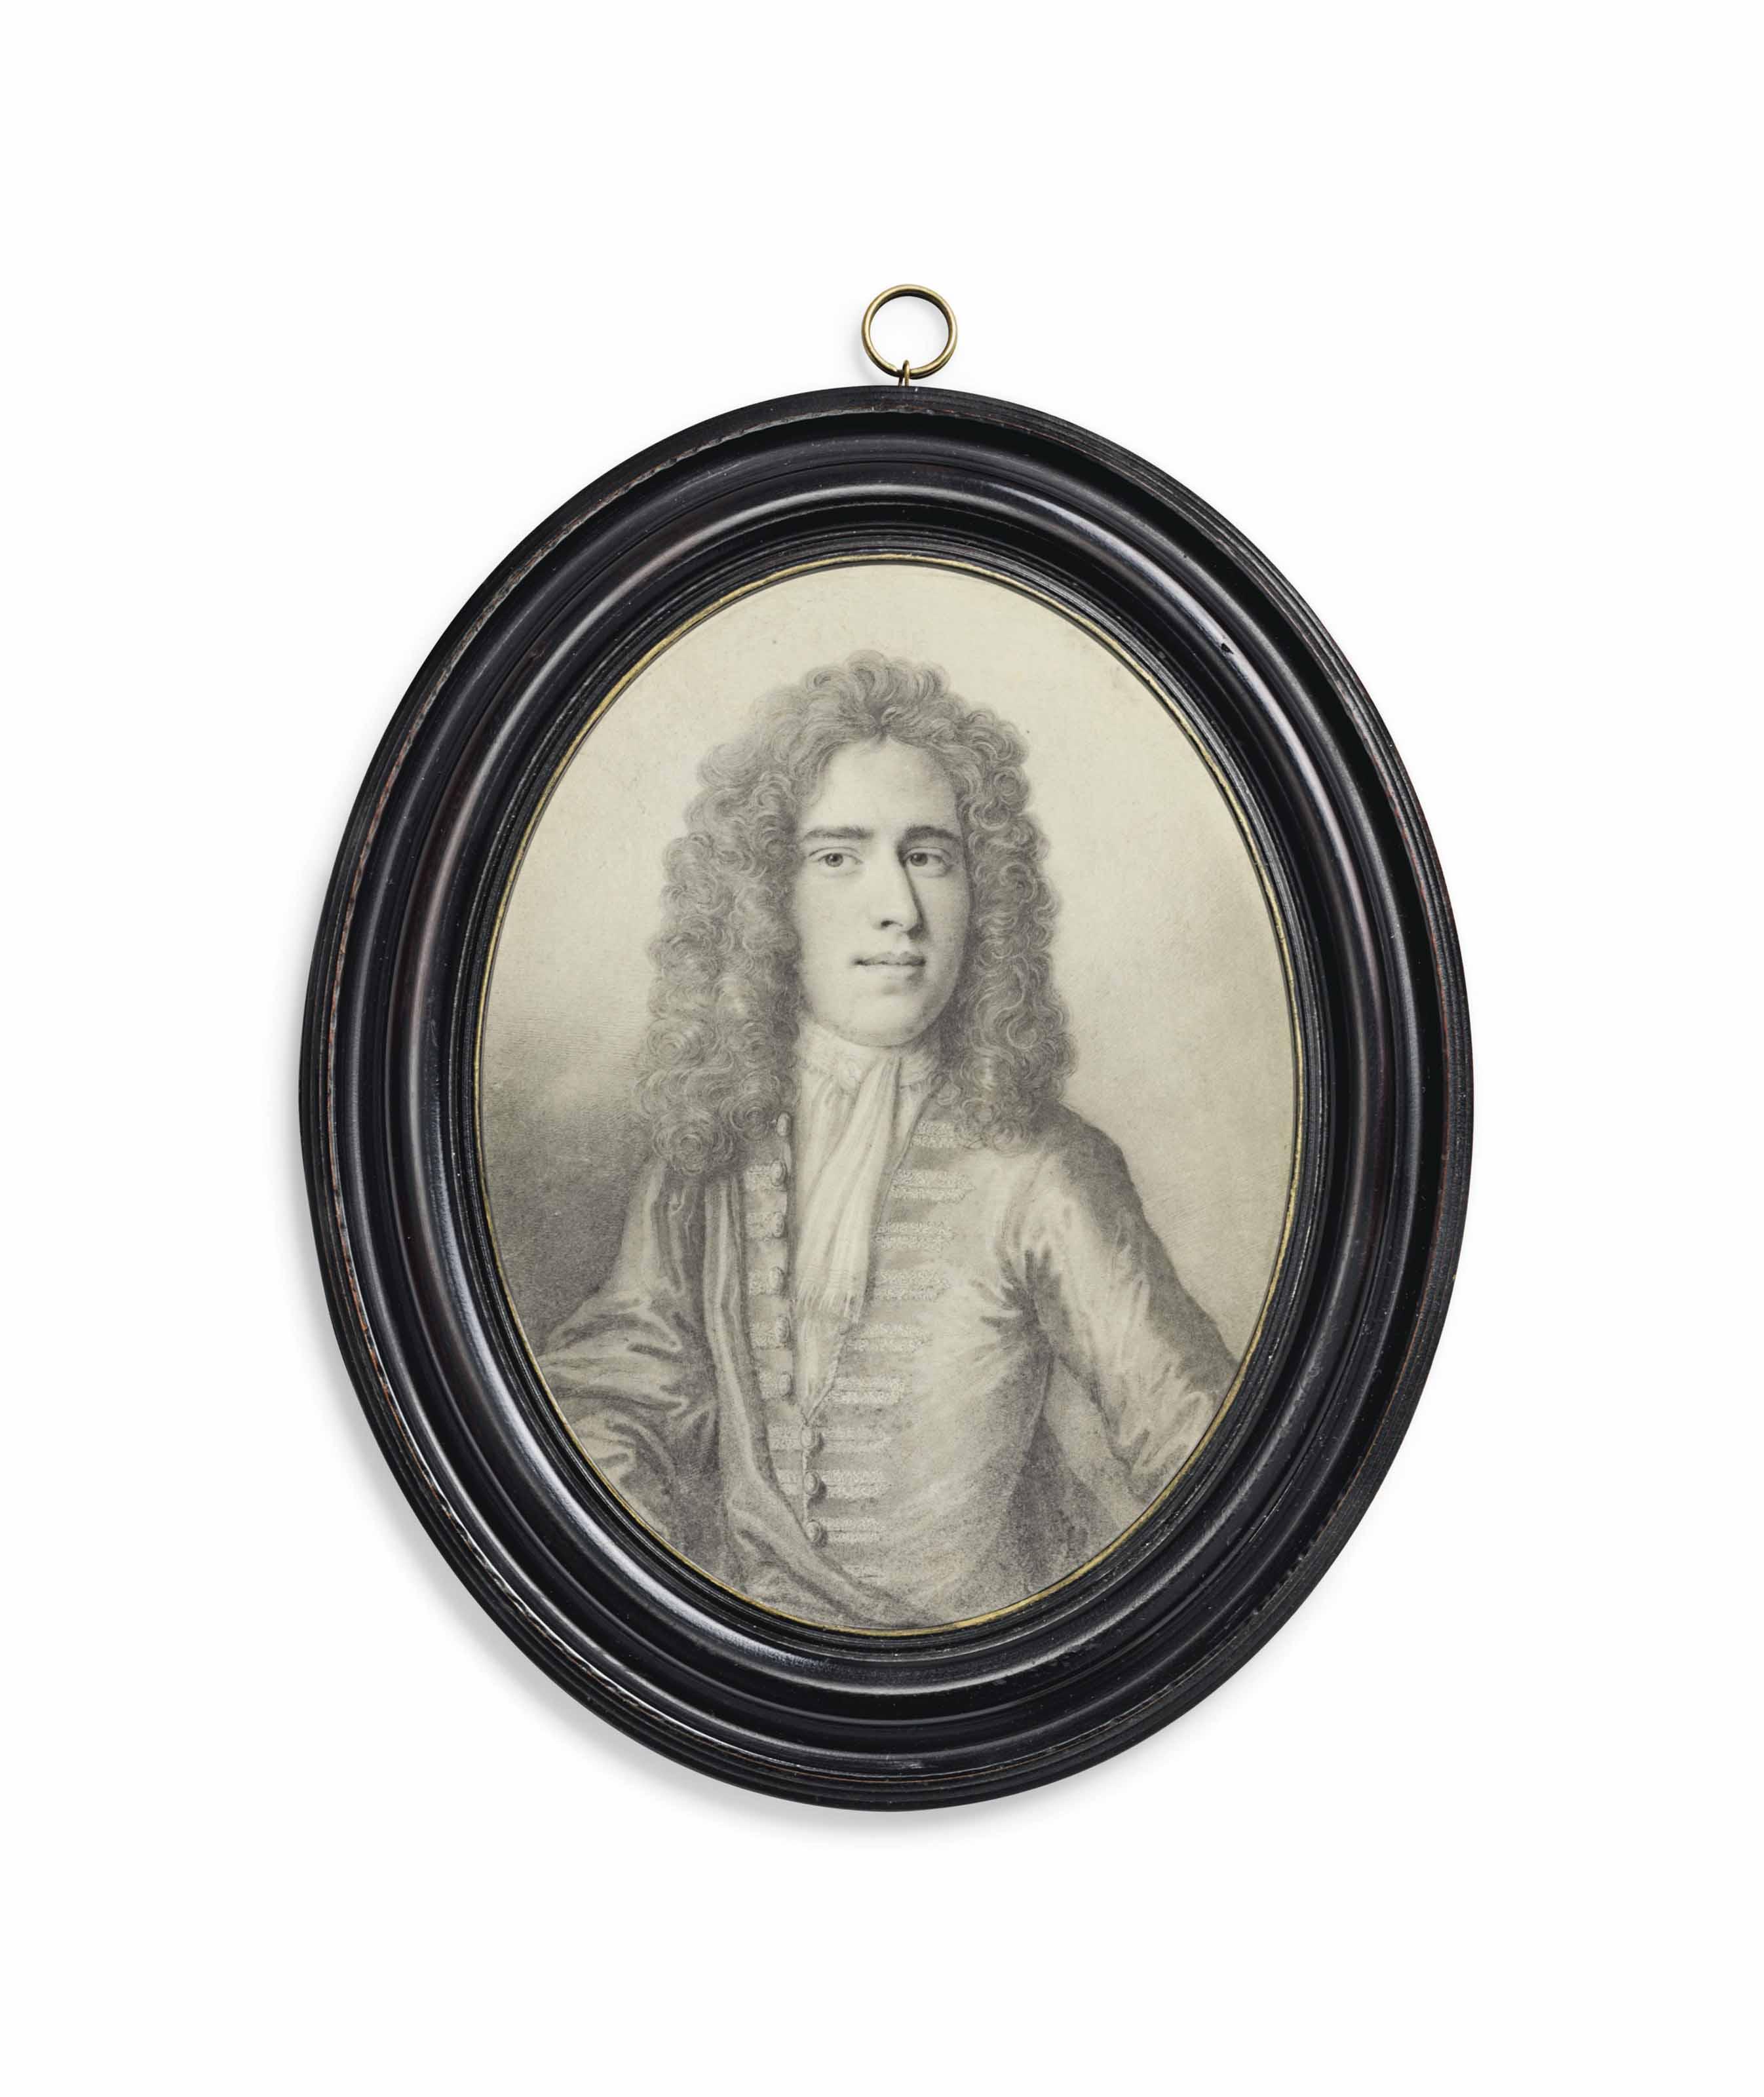 THOMAS FORSTER (BRITISH, C. 1677-1712)